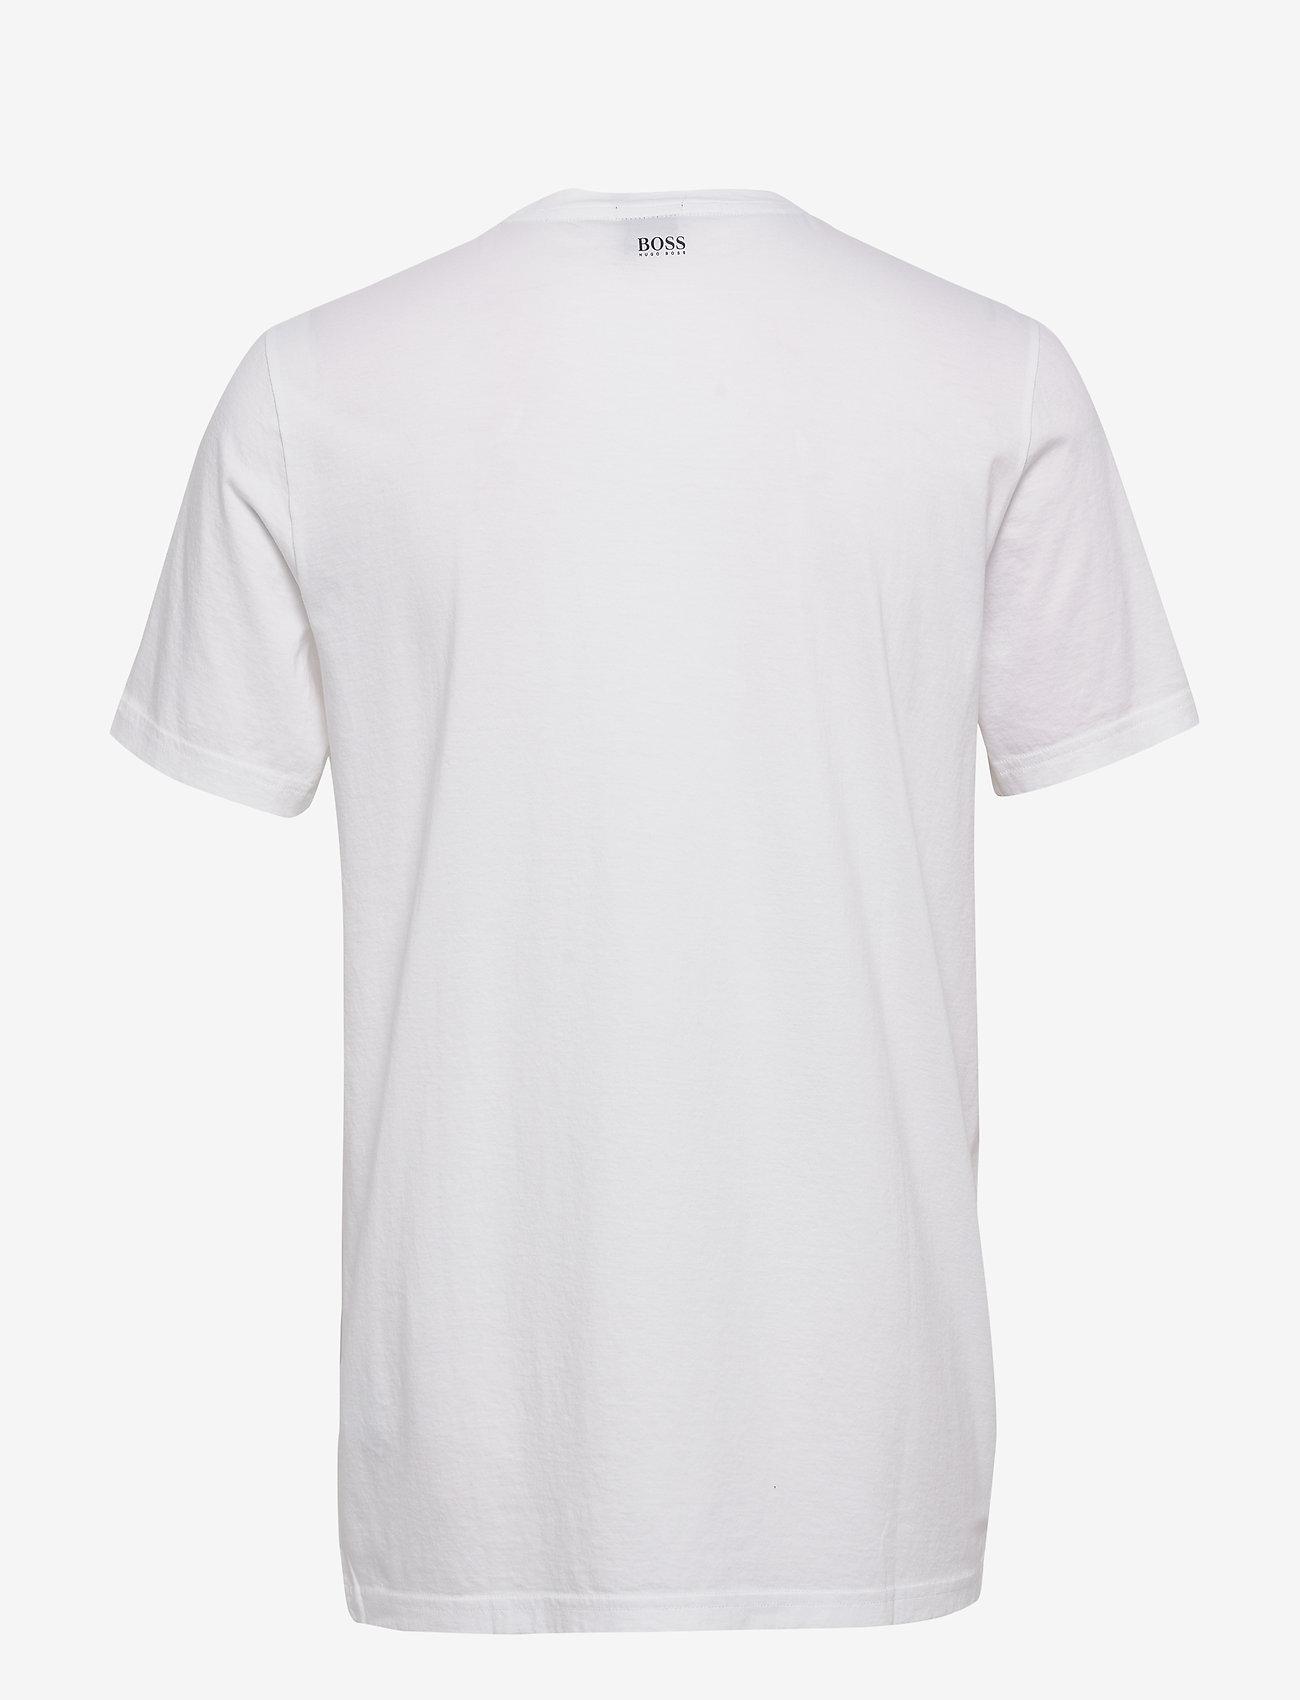 BOSS - TMix - kortærmede t-shirts - natural - 1